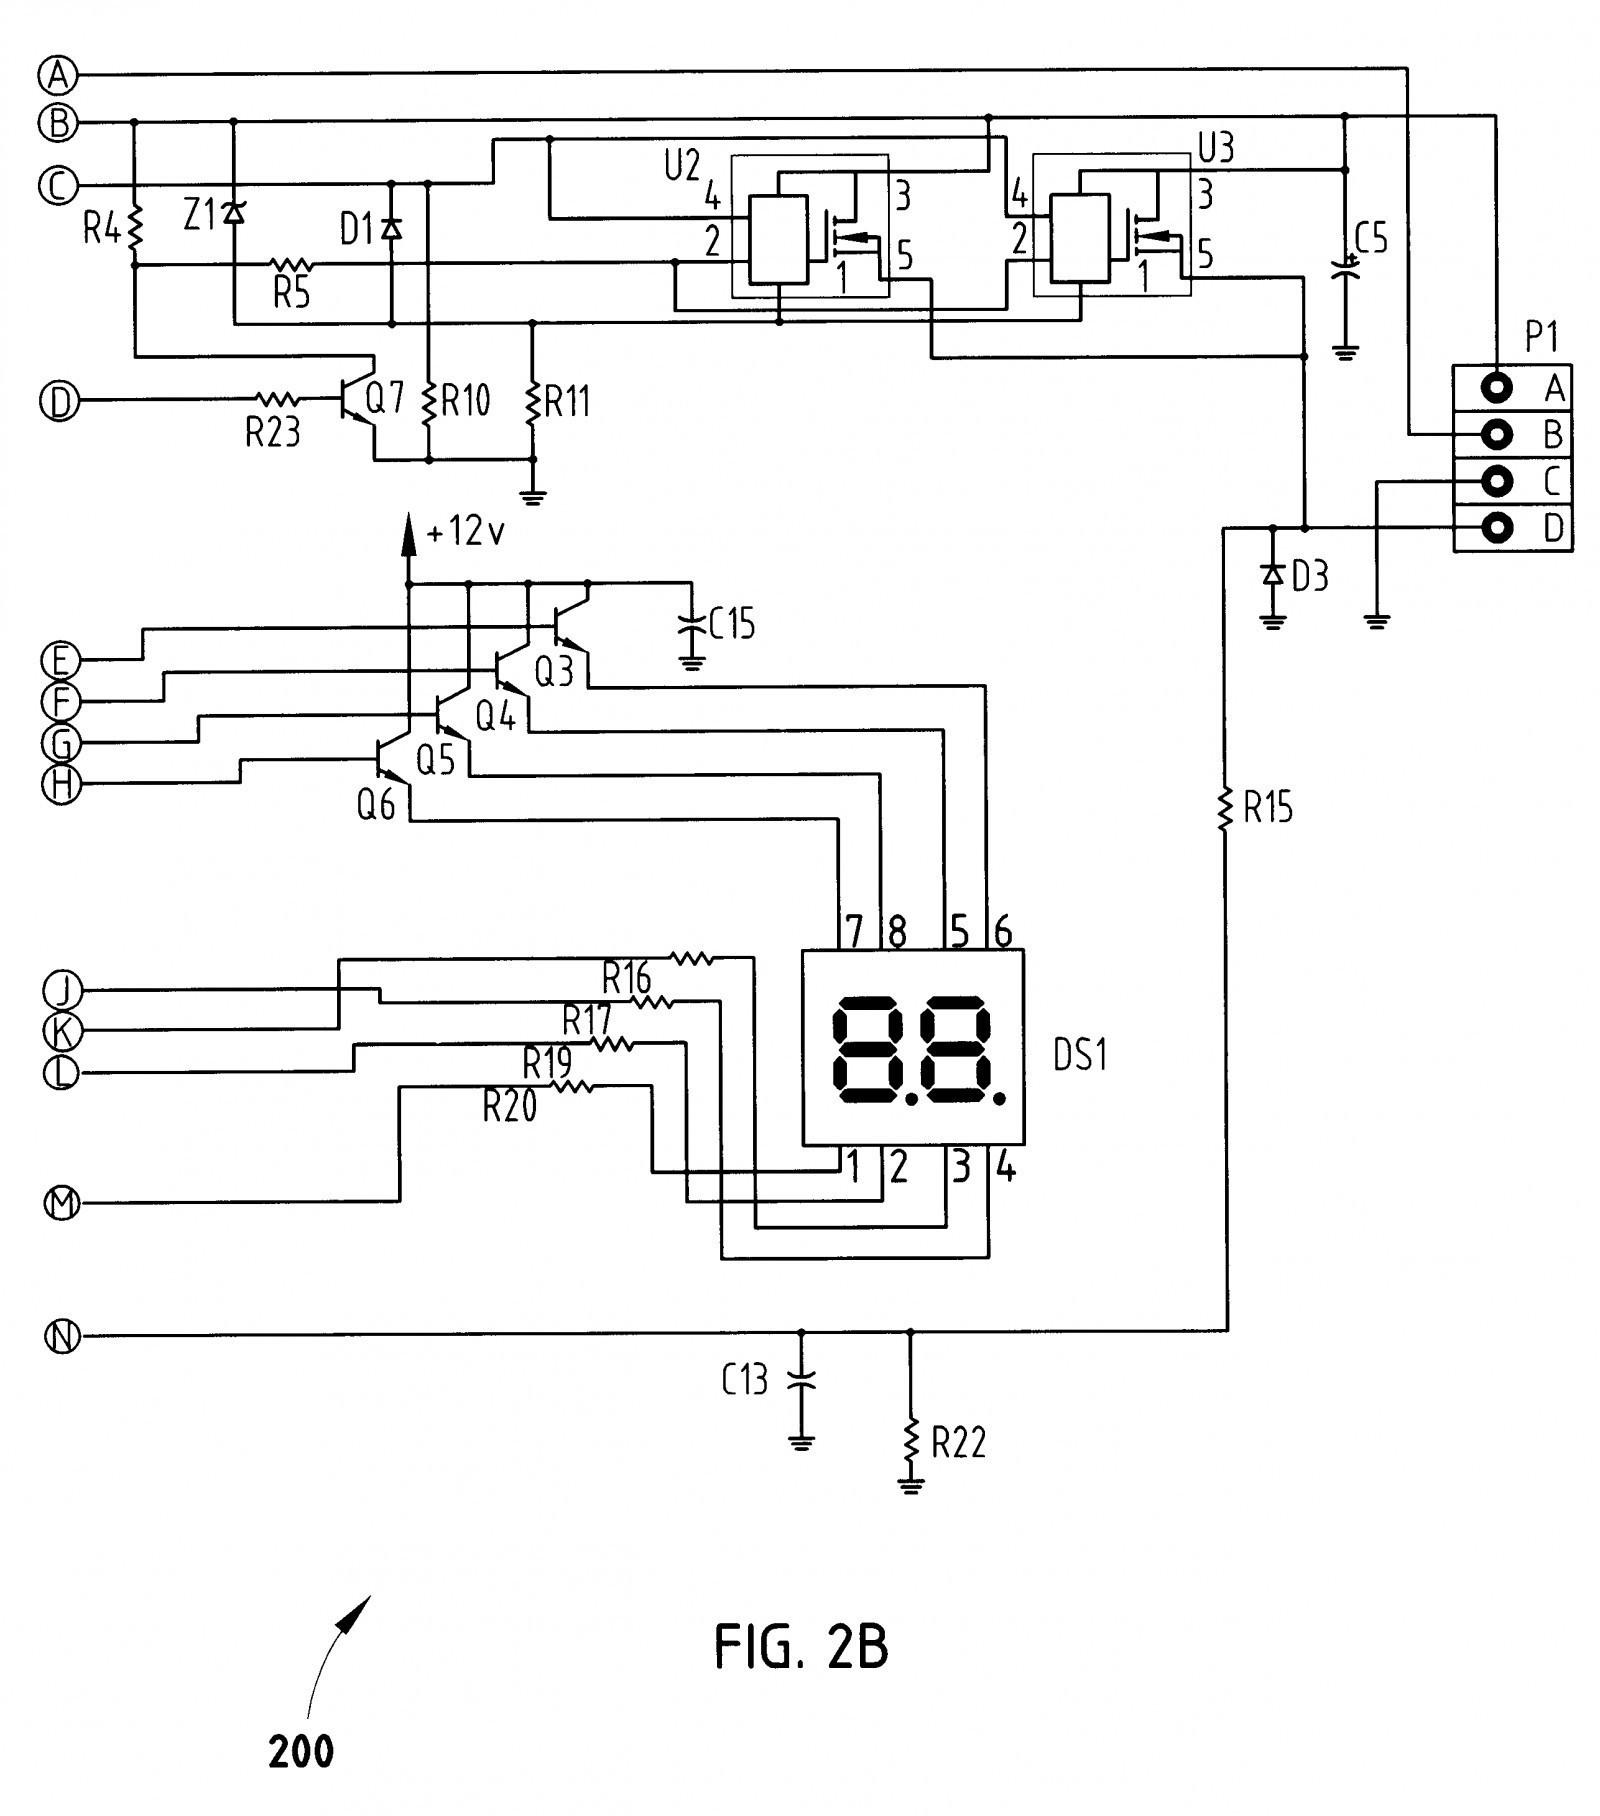 Wiring Diagram for Trailer Brake Controller New Hopkins Brake Controller Wiring Diagram Electrics Schematic for Curt